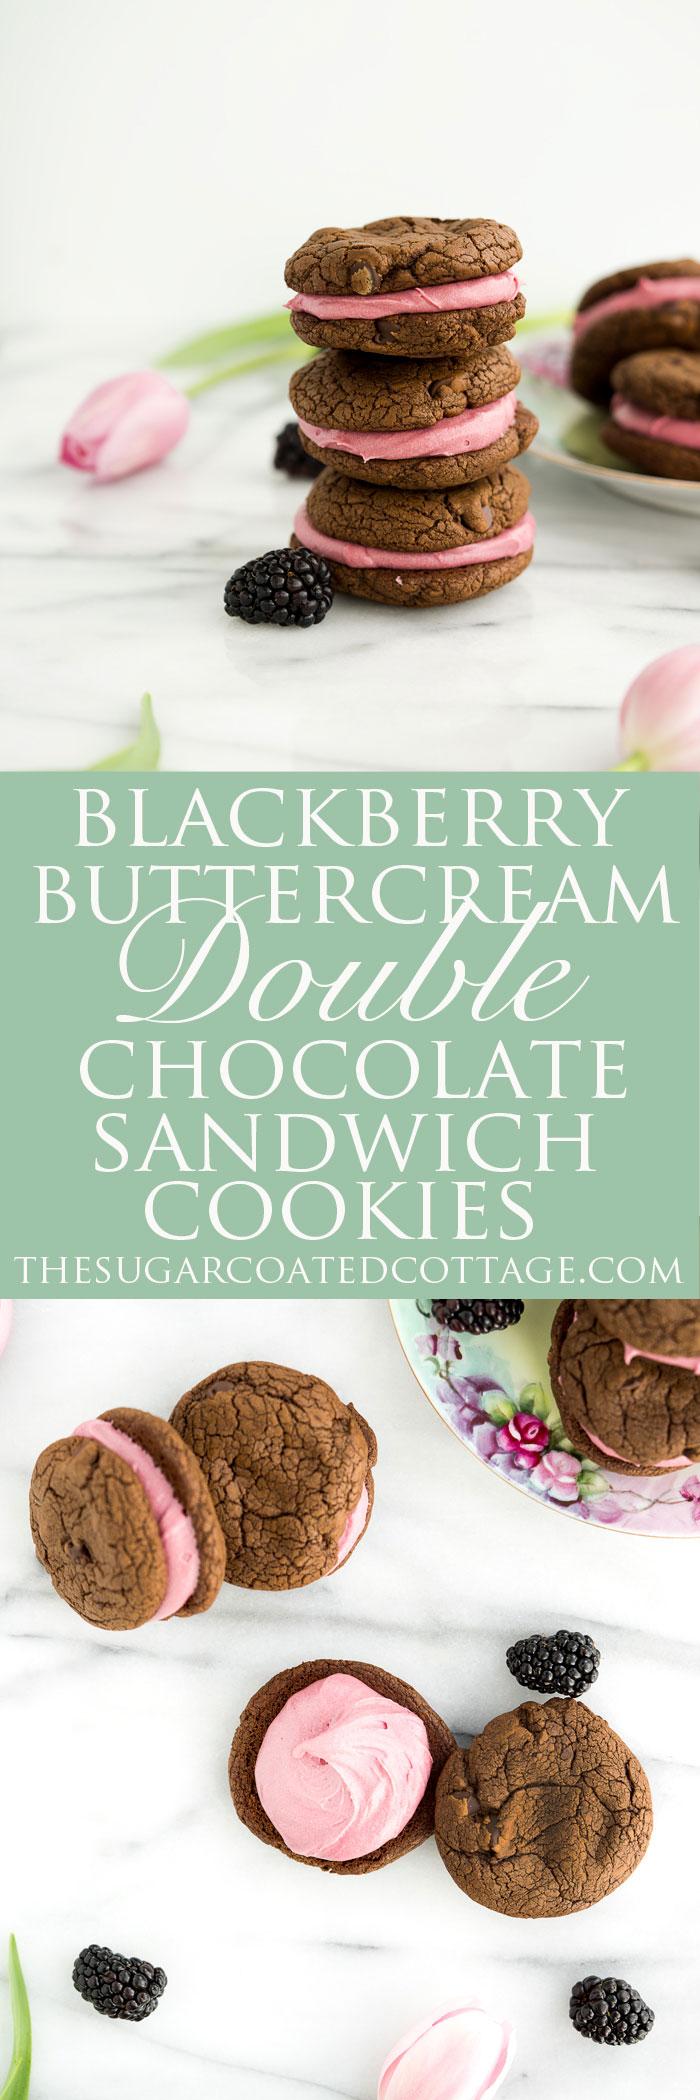 Blackberry Buttercream Double Chocolate Sandwich Cookie Recipe. Sweet blackberry buttercream sandwiched between two double chocolate cookies. #cookies #buttercream #recipe #blackberry | thesugarcoatedcottage.com